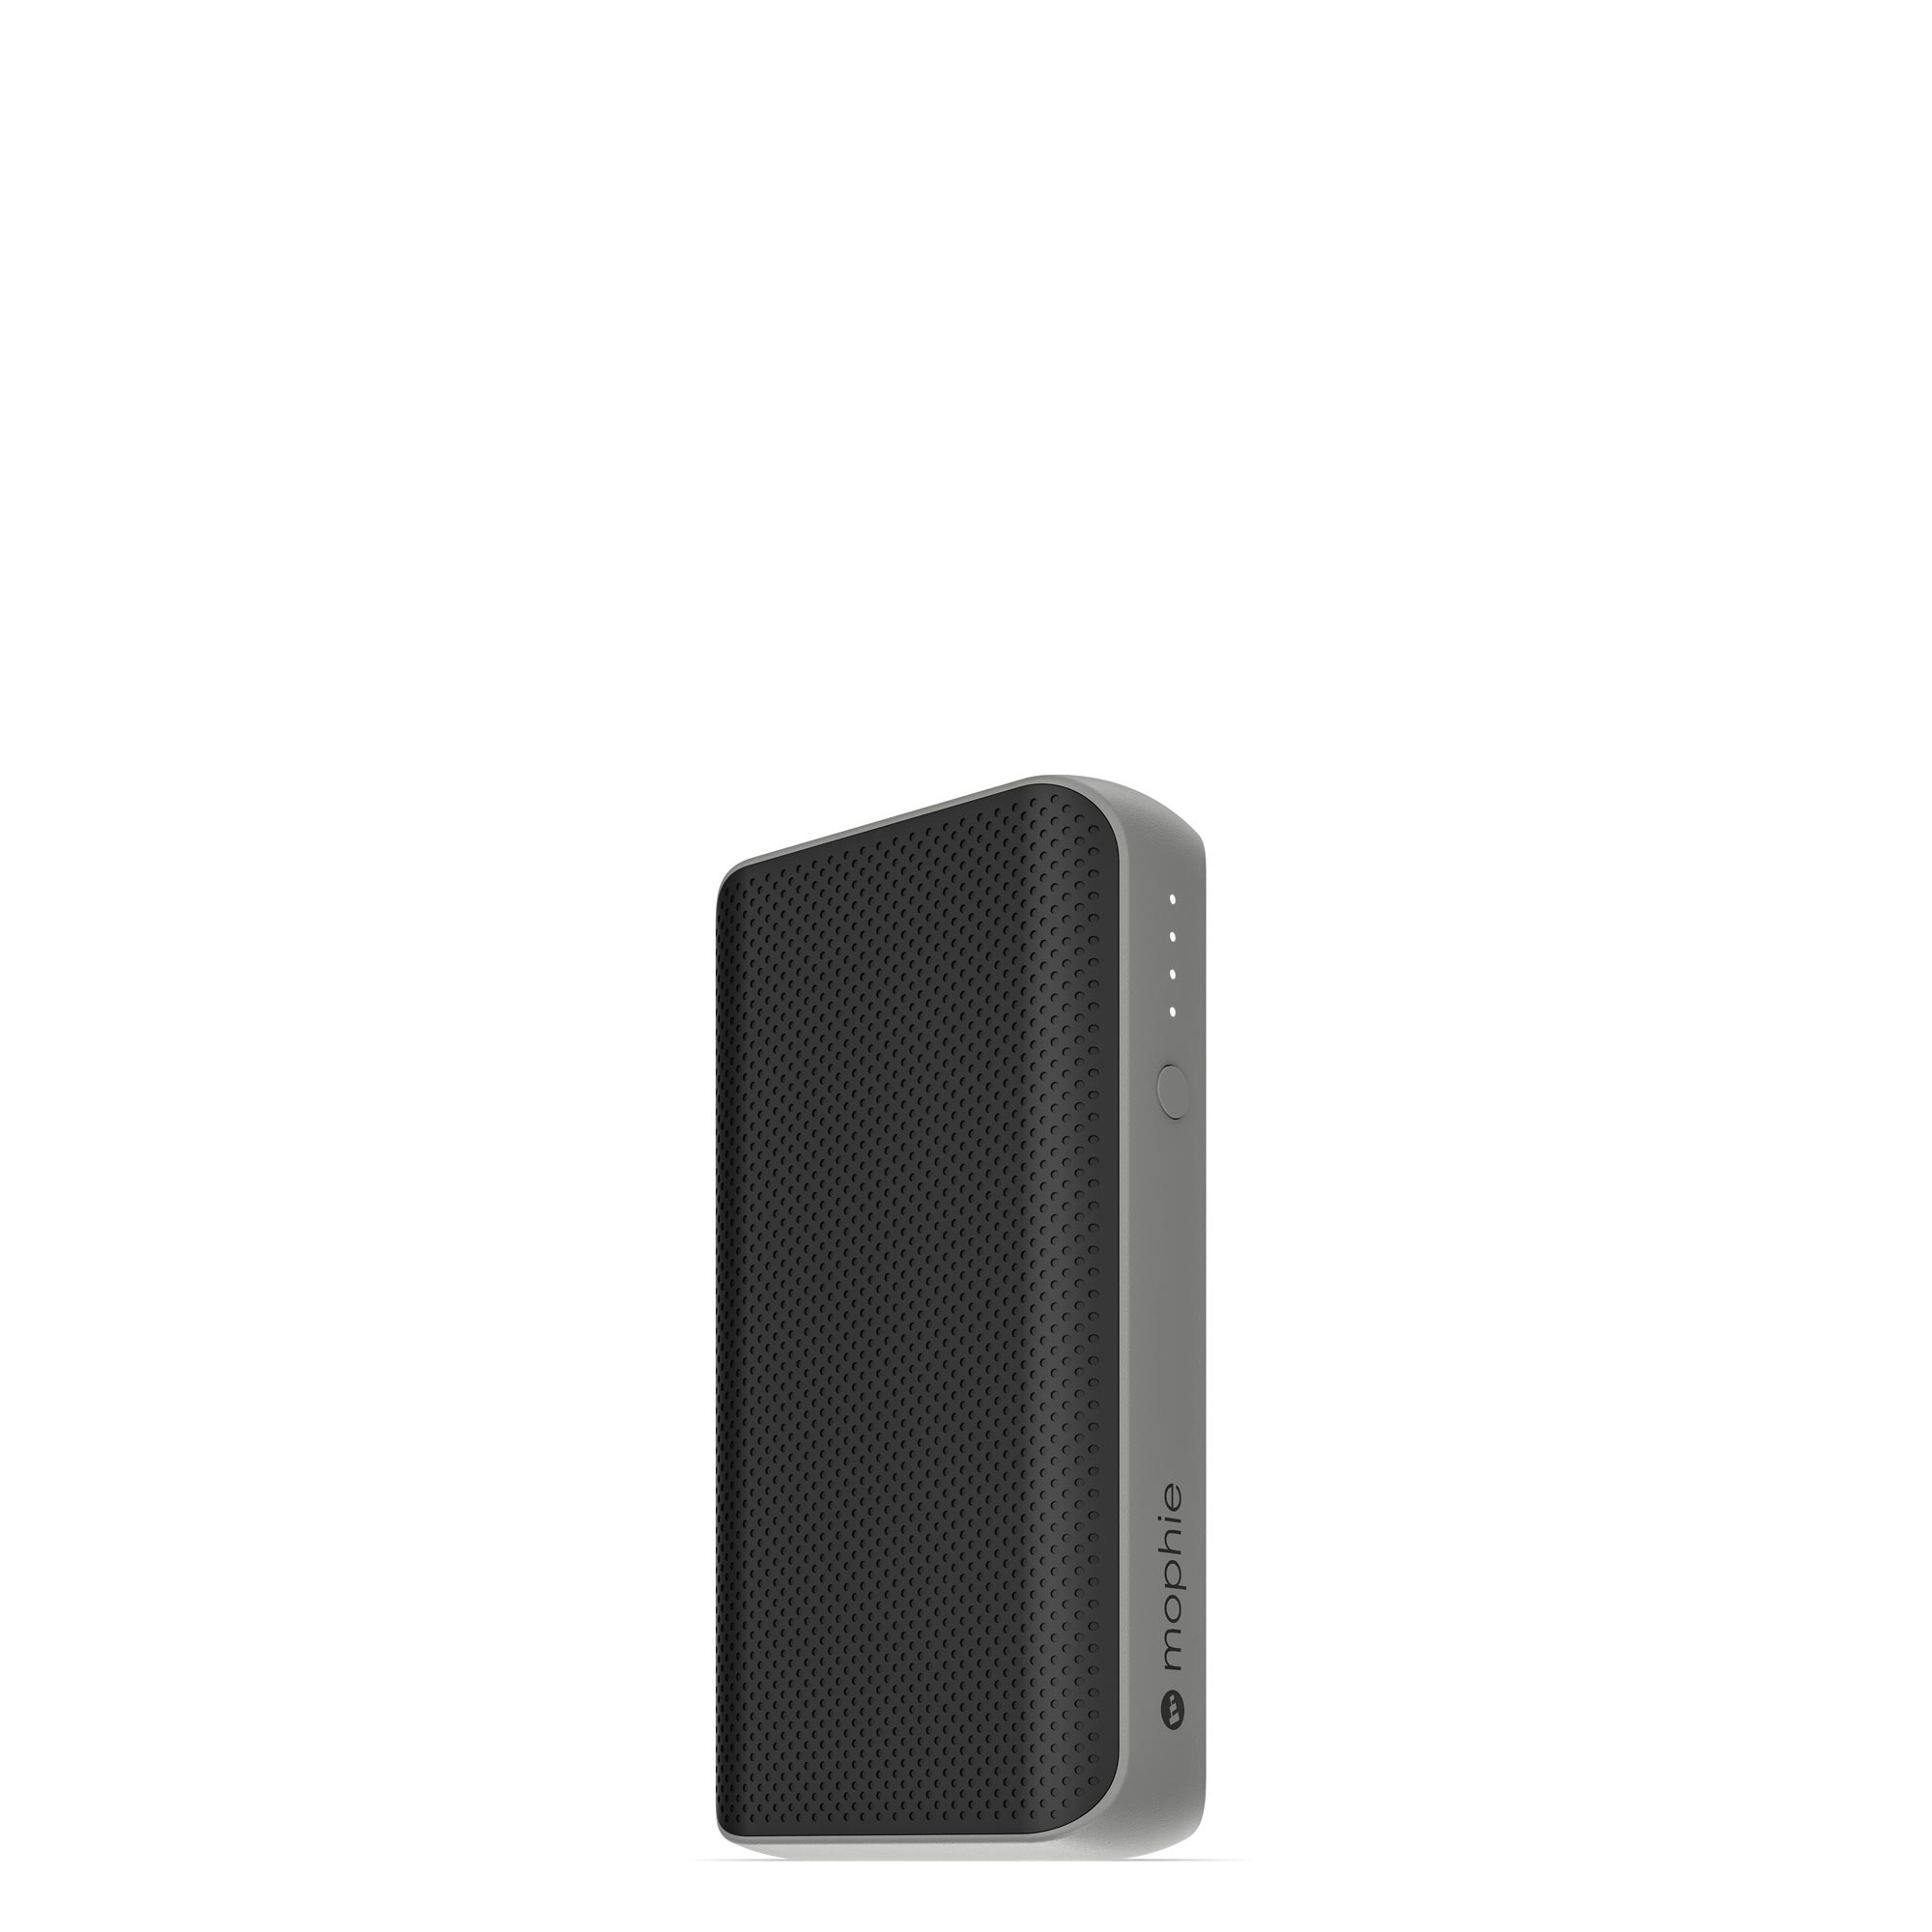 mophie 401101512 batería externa Negro 6700 mAh